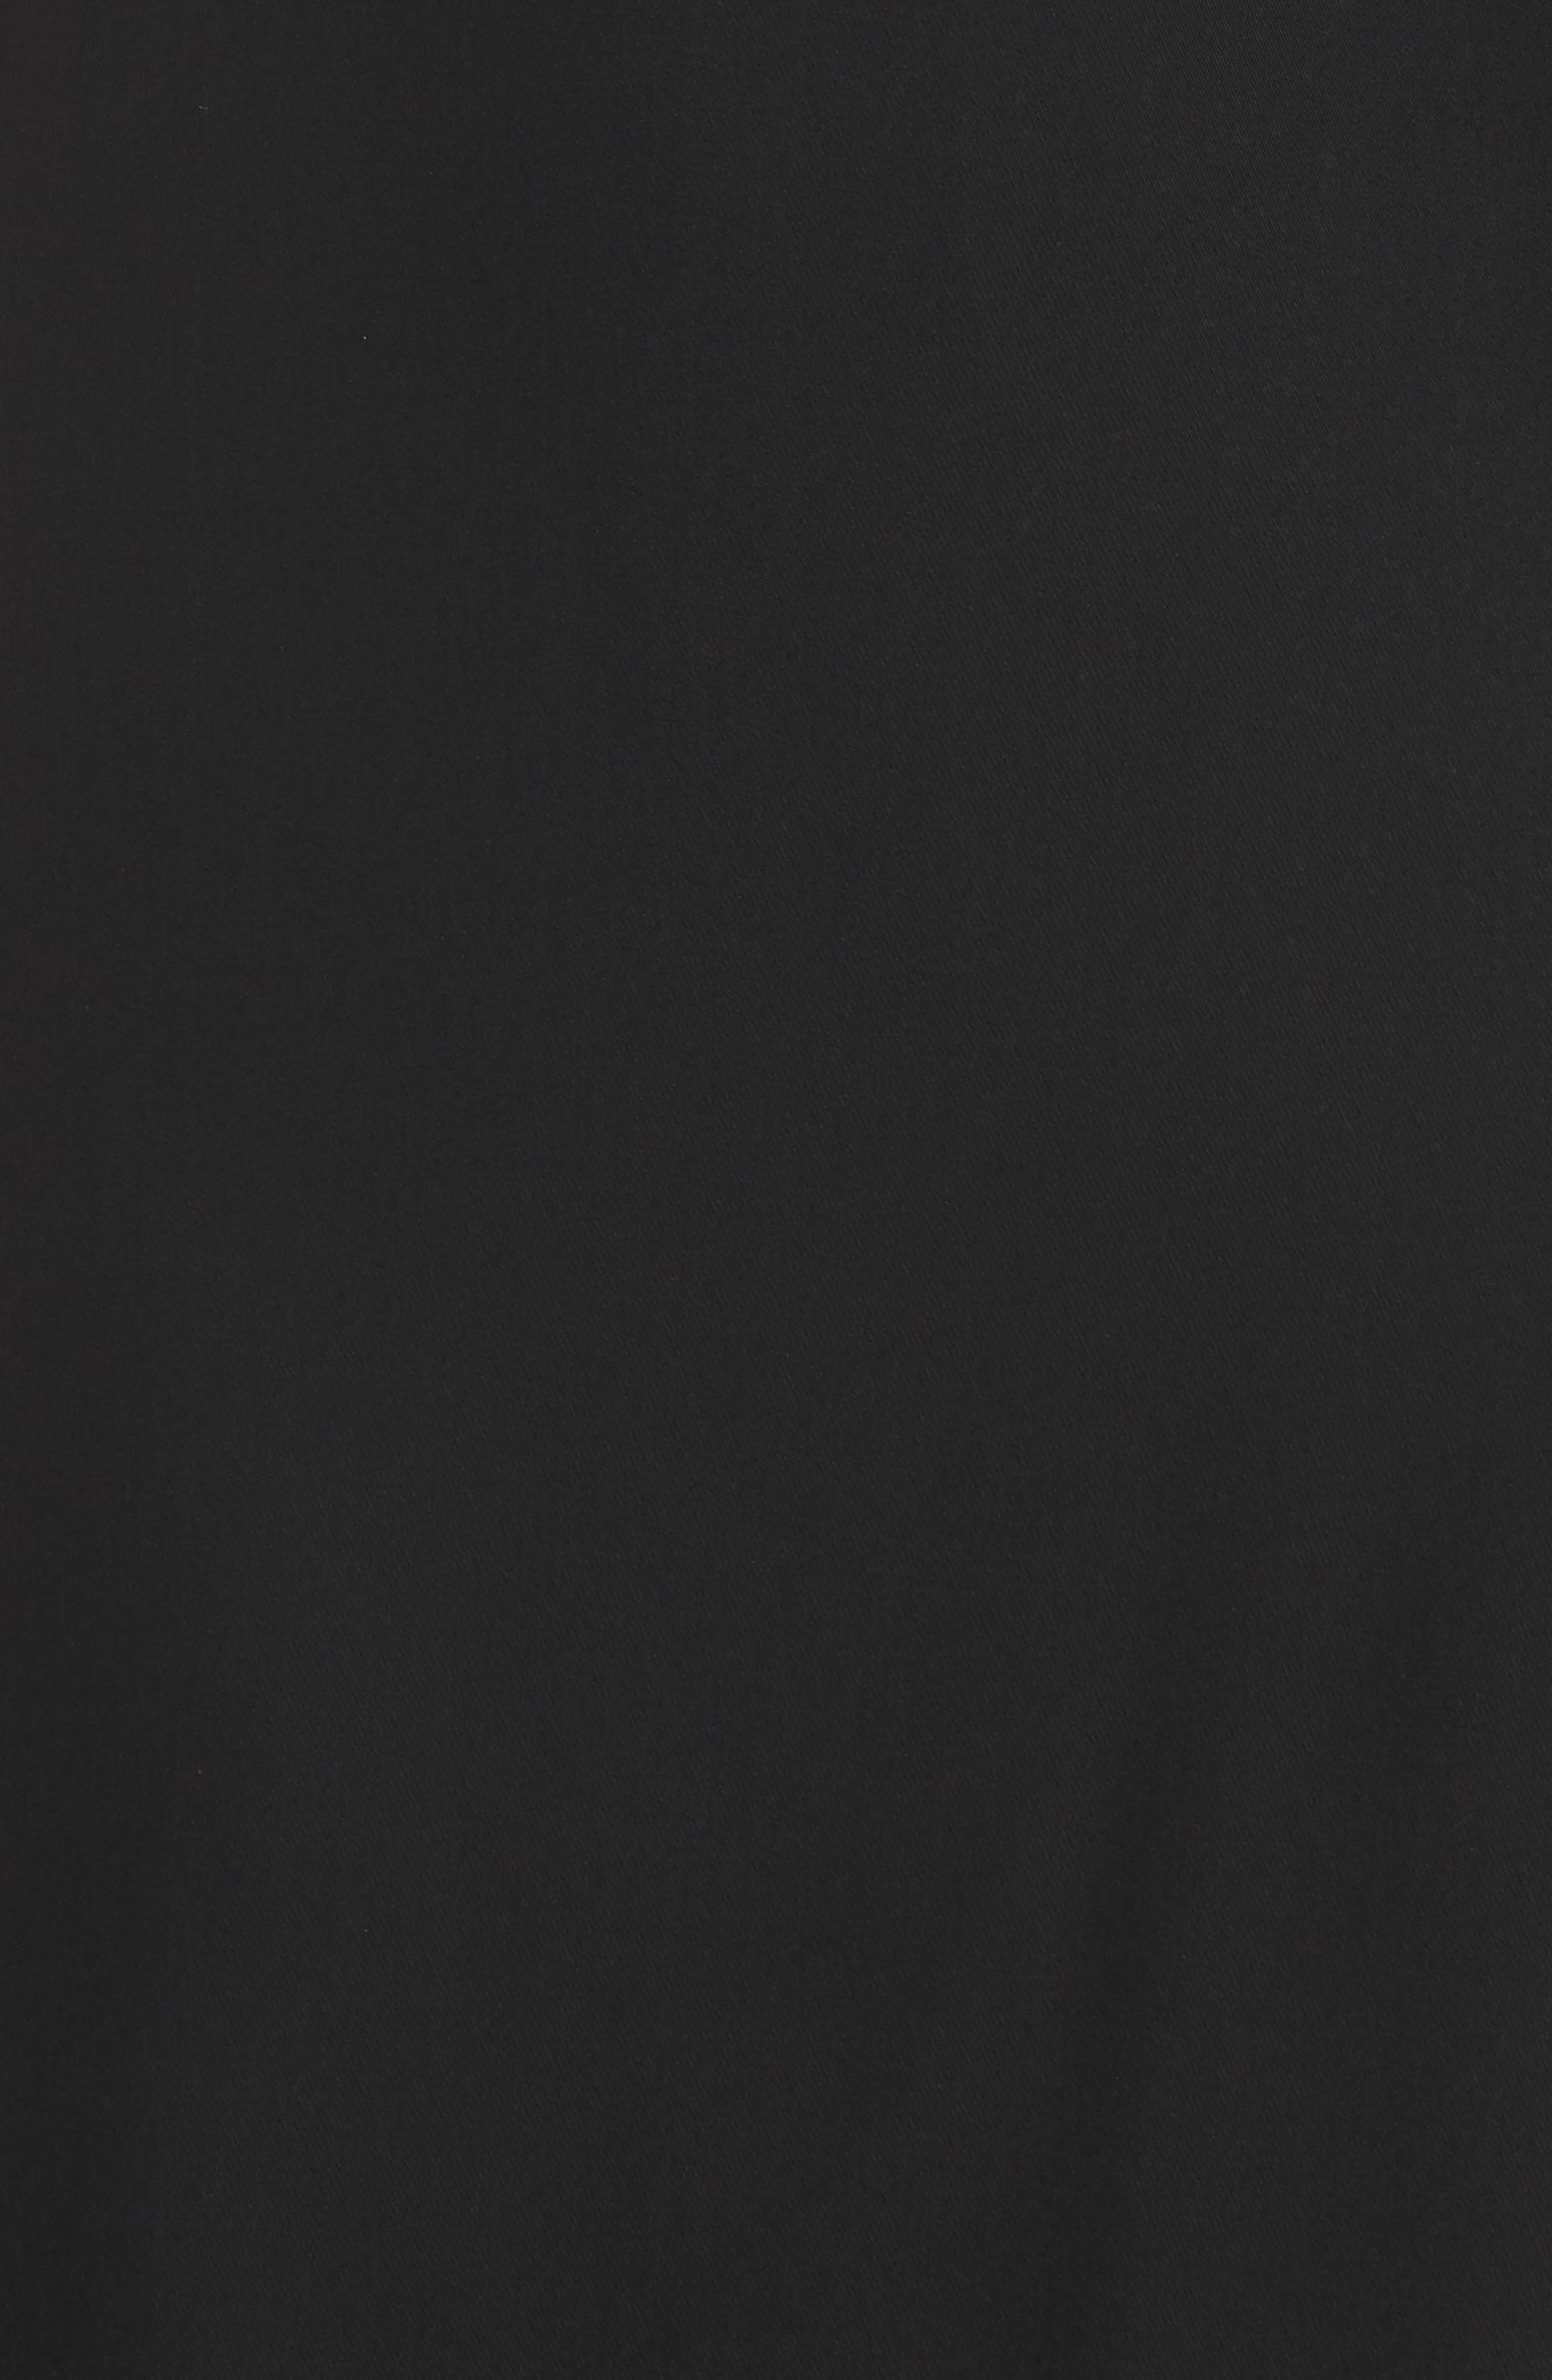 One-Shoulder Crepe Gown,                             Alternate thumbnail 6, color,                             BLACK/ NUDE